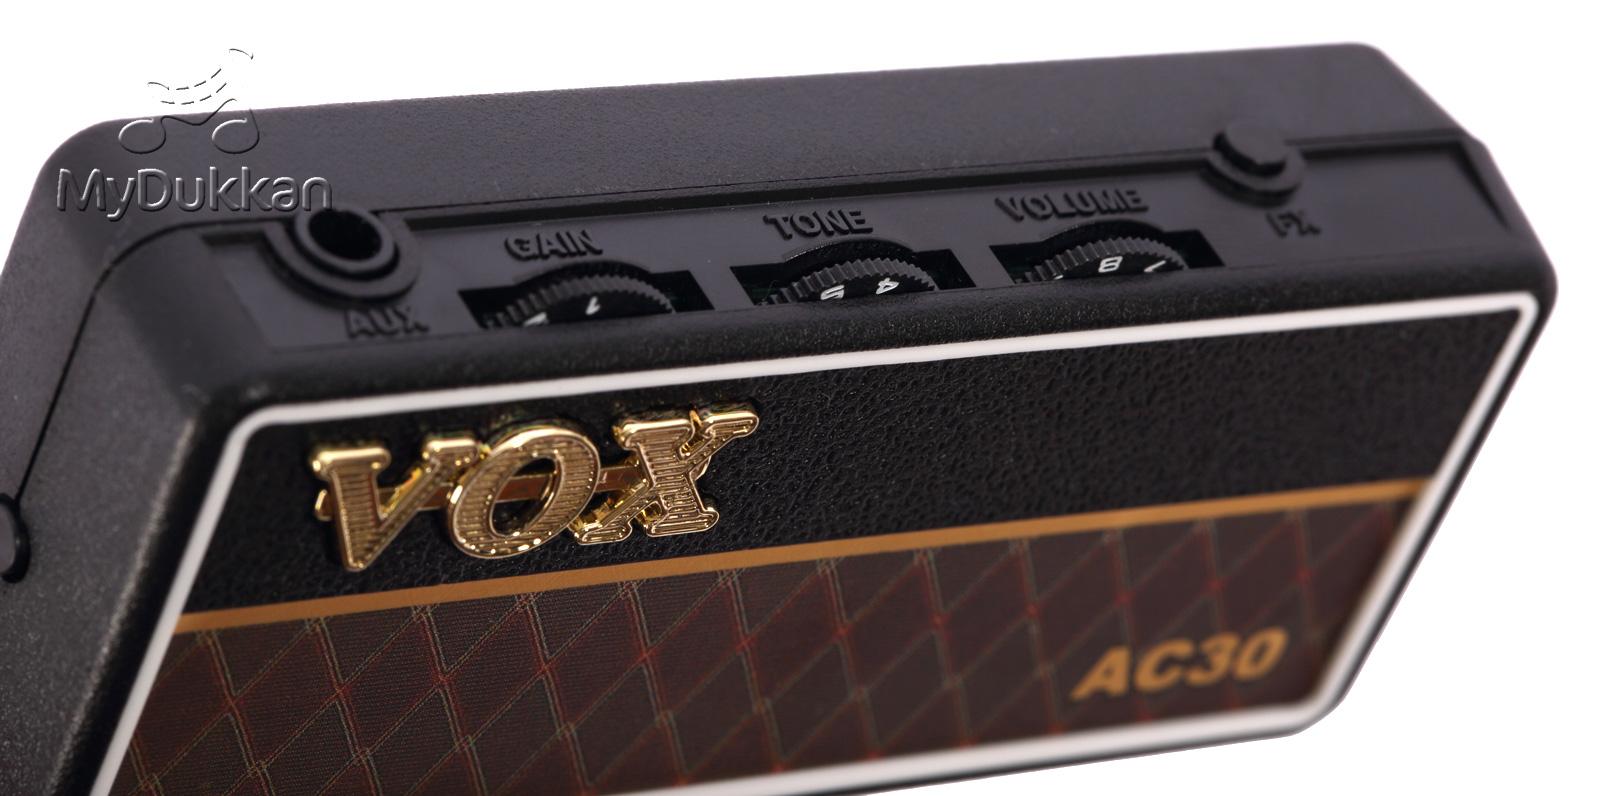 vox ac30 headphone amp manual